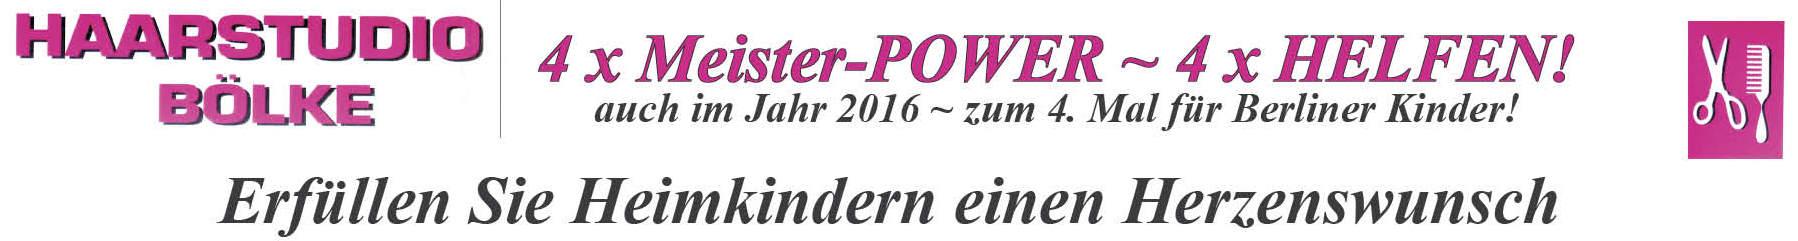 141-wp-03-haarstudio-boelke-heimkinder-wunschbaum-elisabethstift